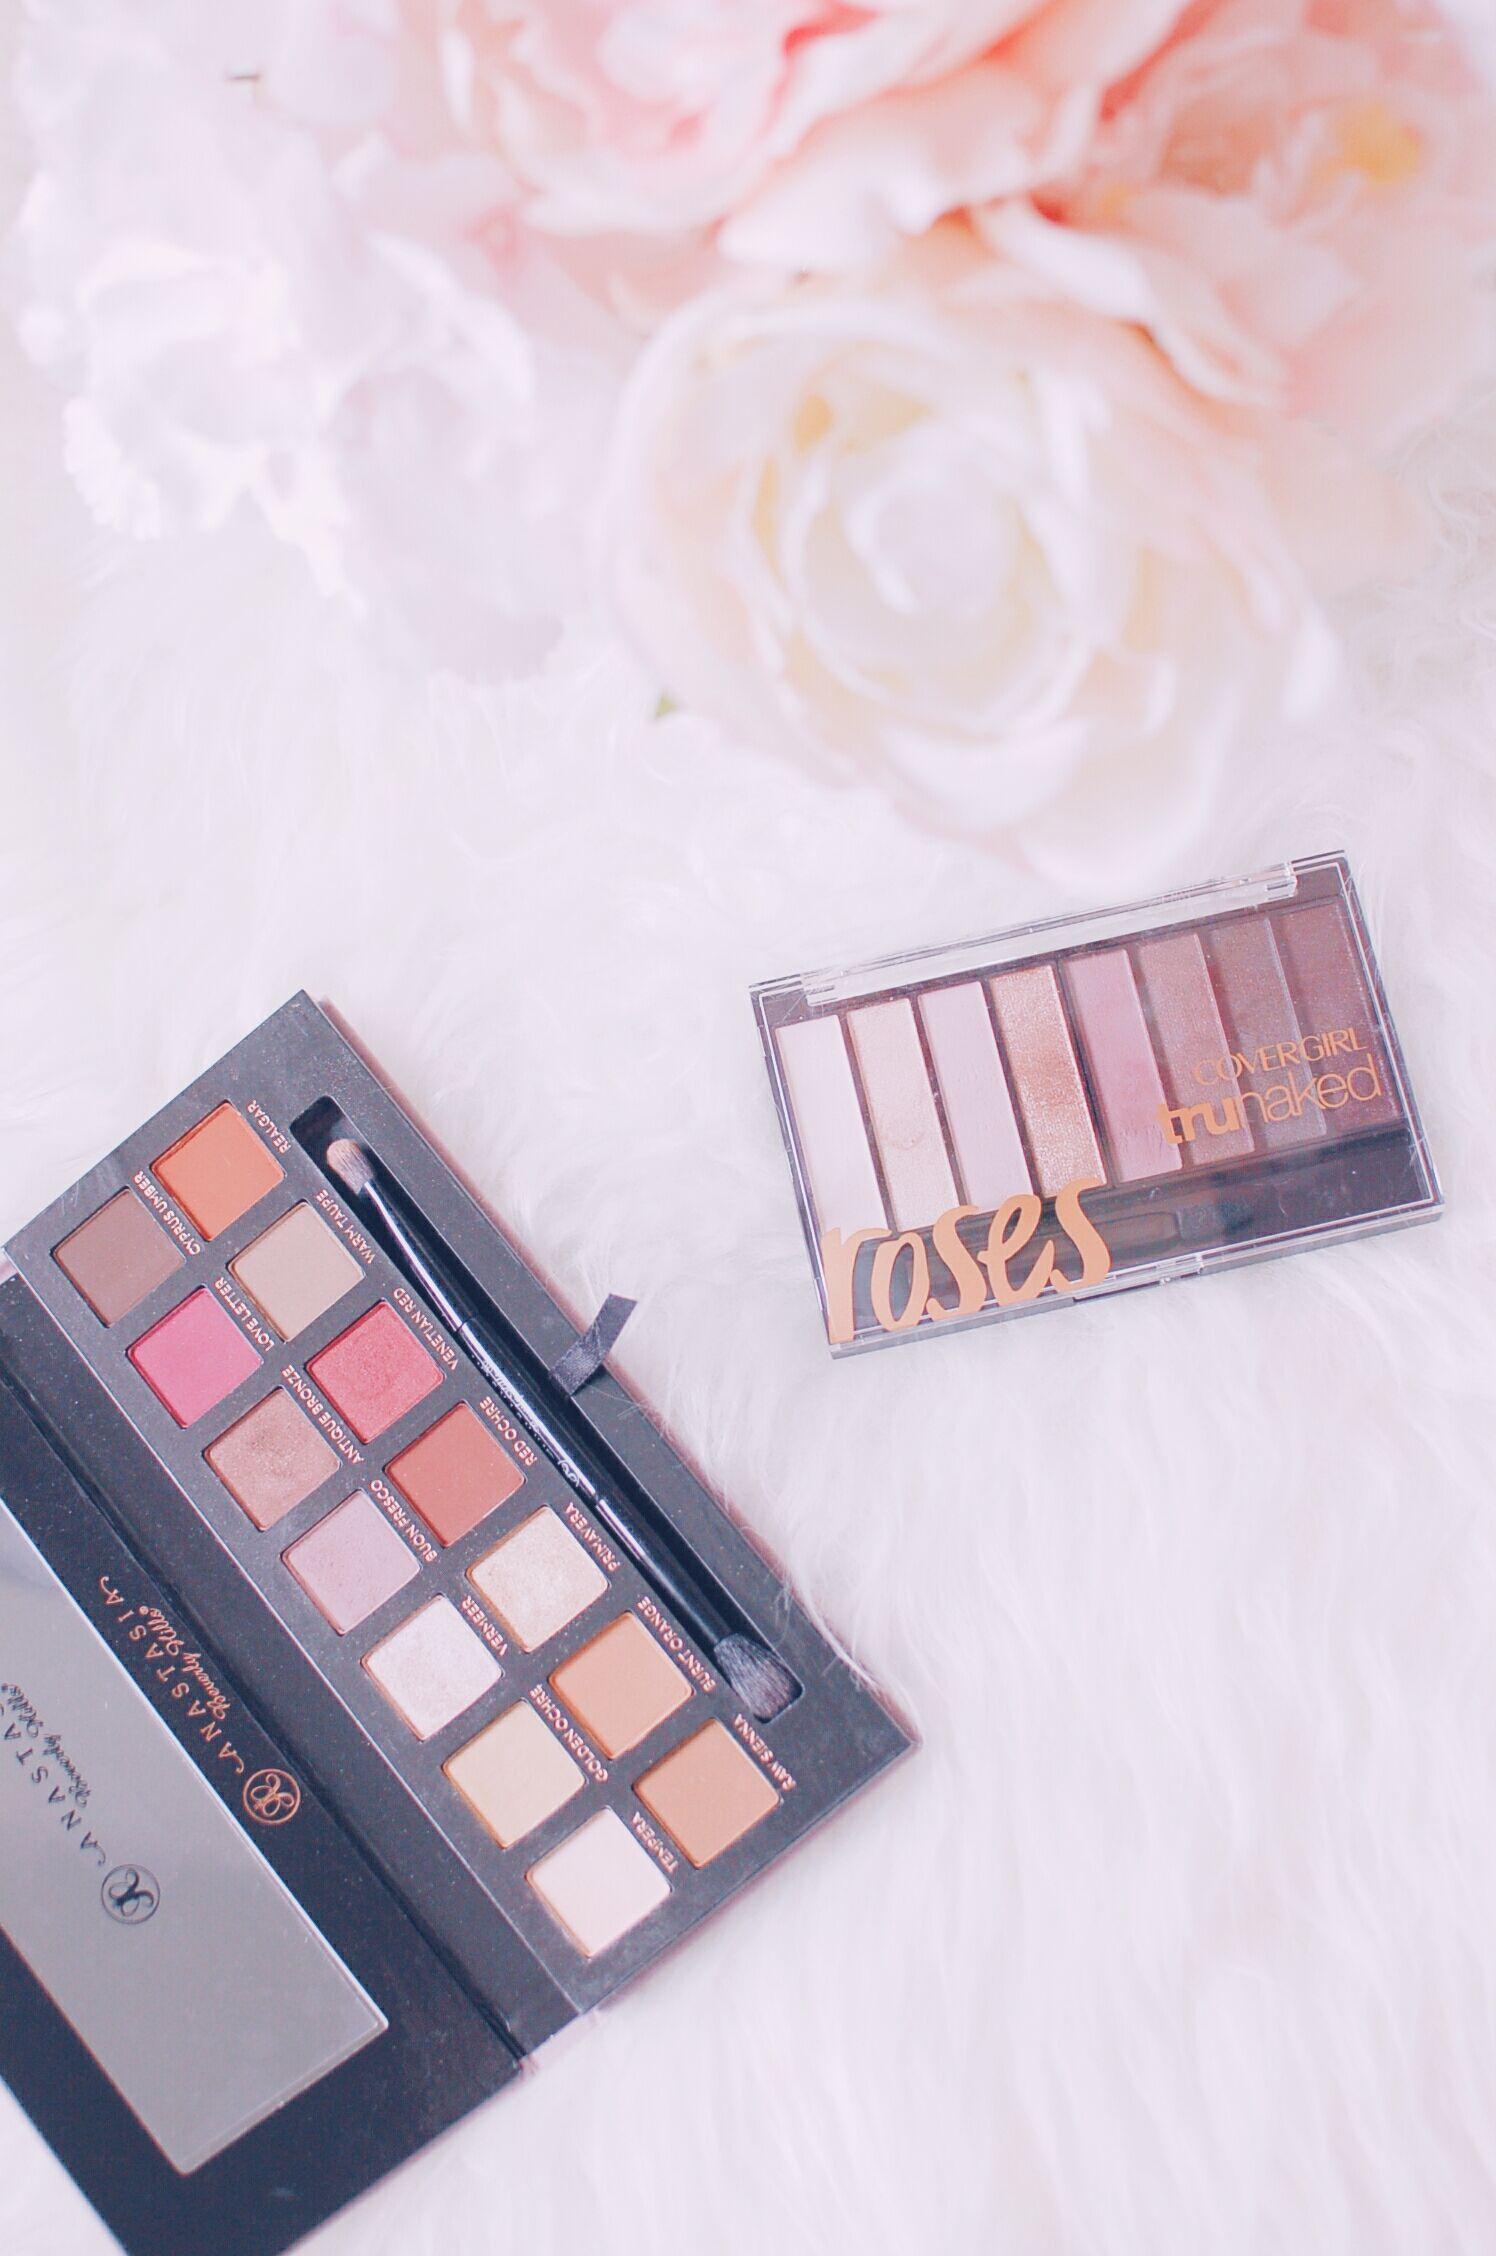 Drugstore vs. Luxury brand cosmetics Part II Cosmetics